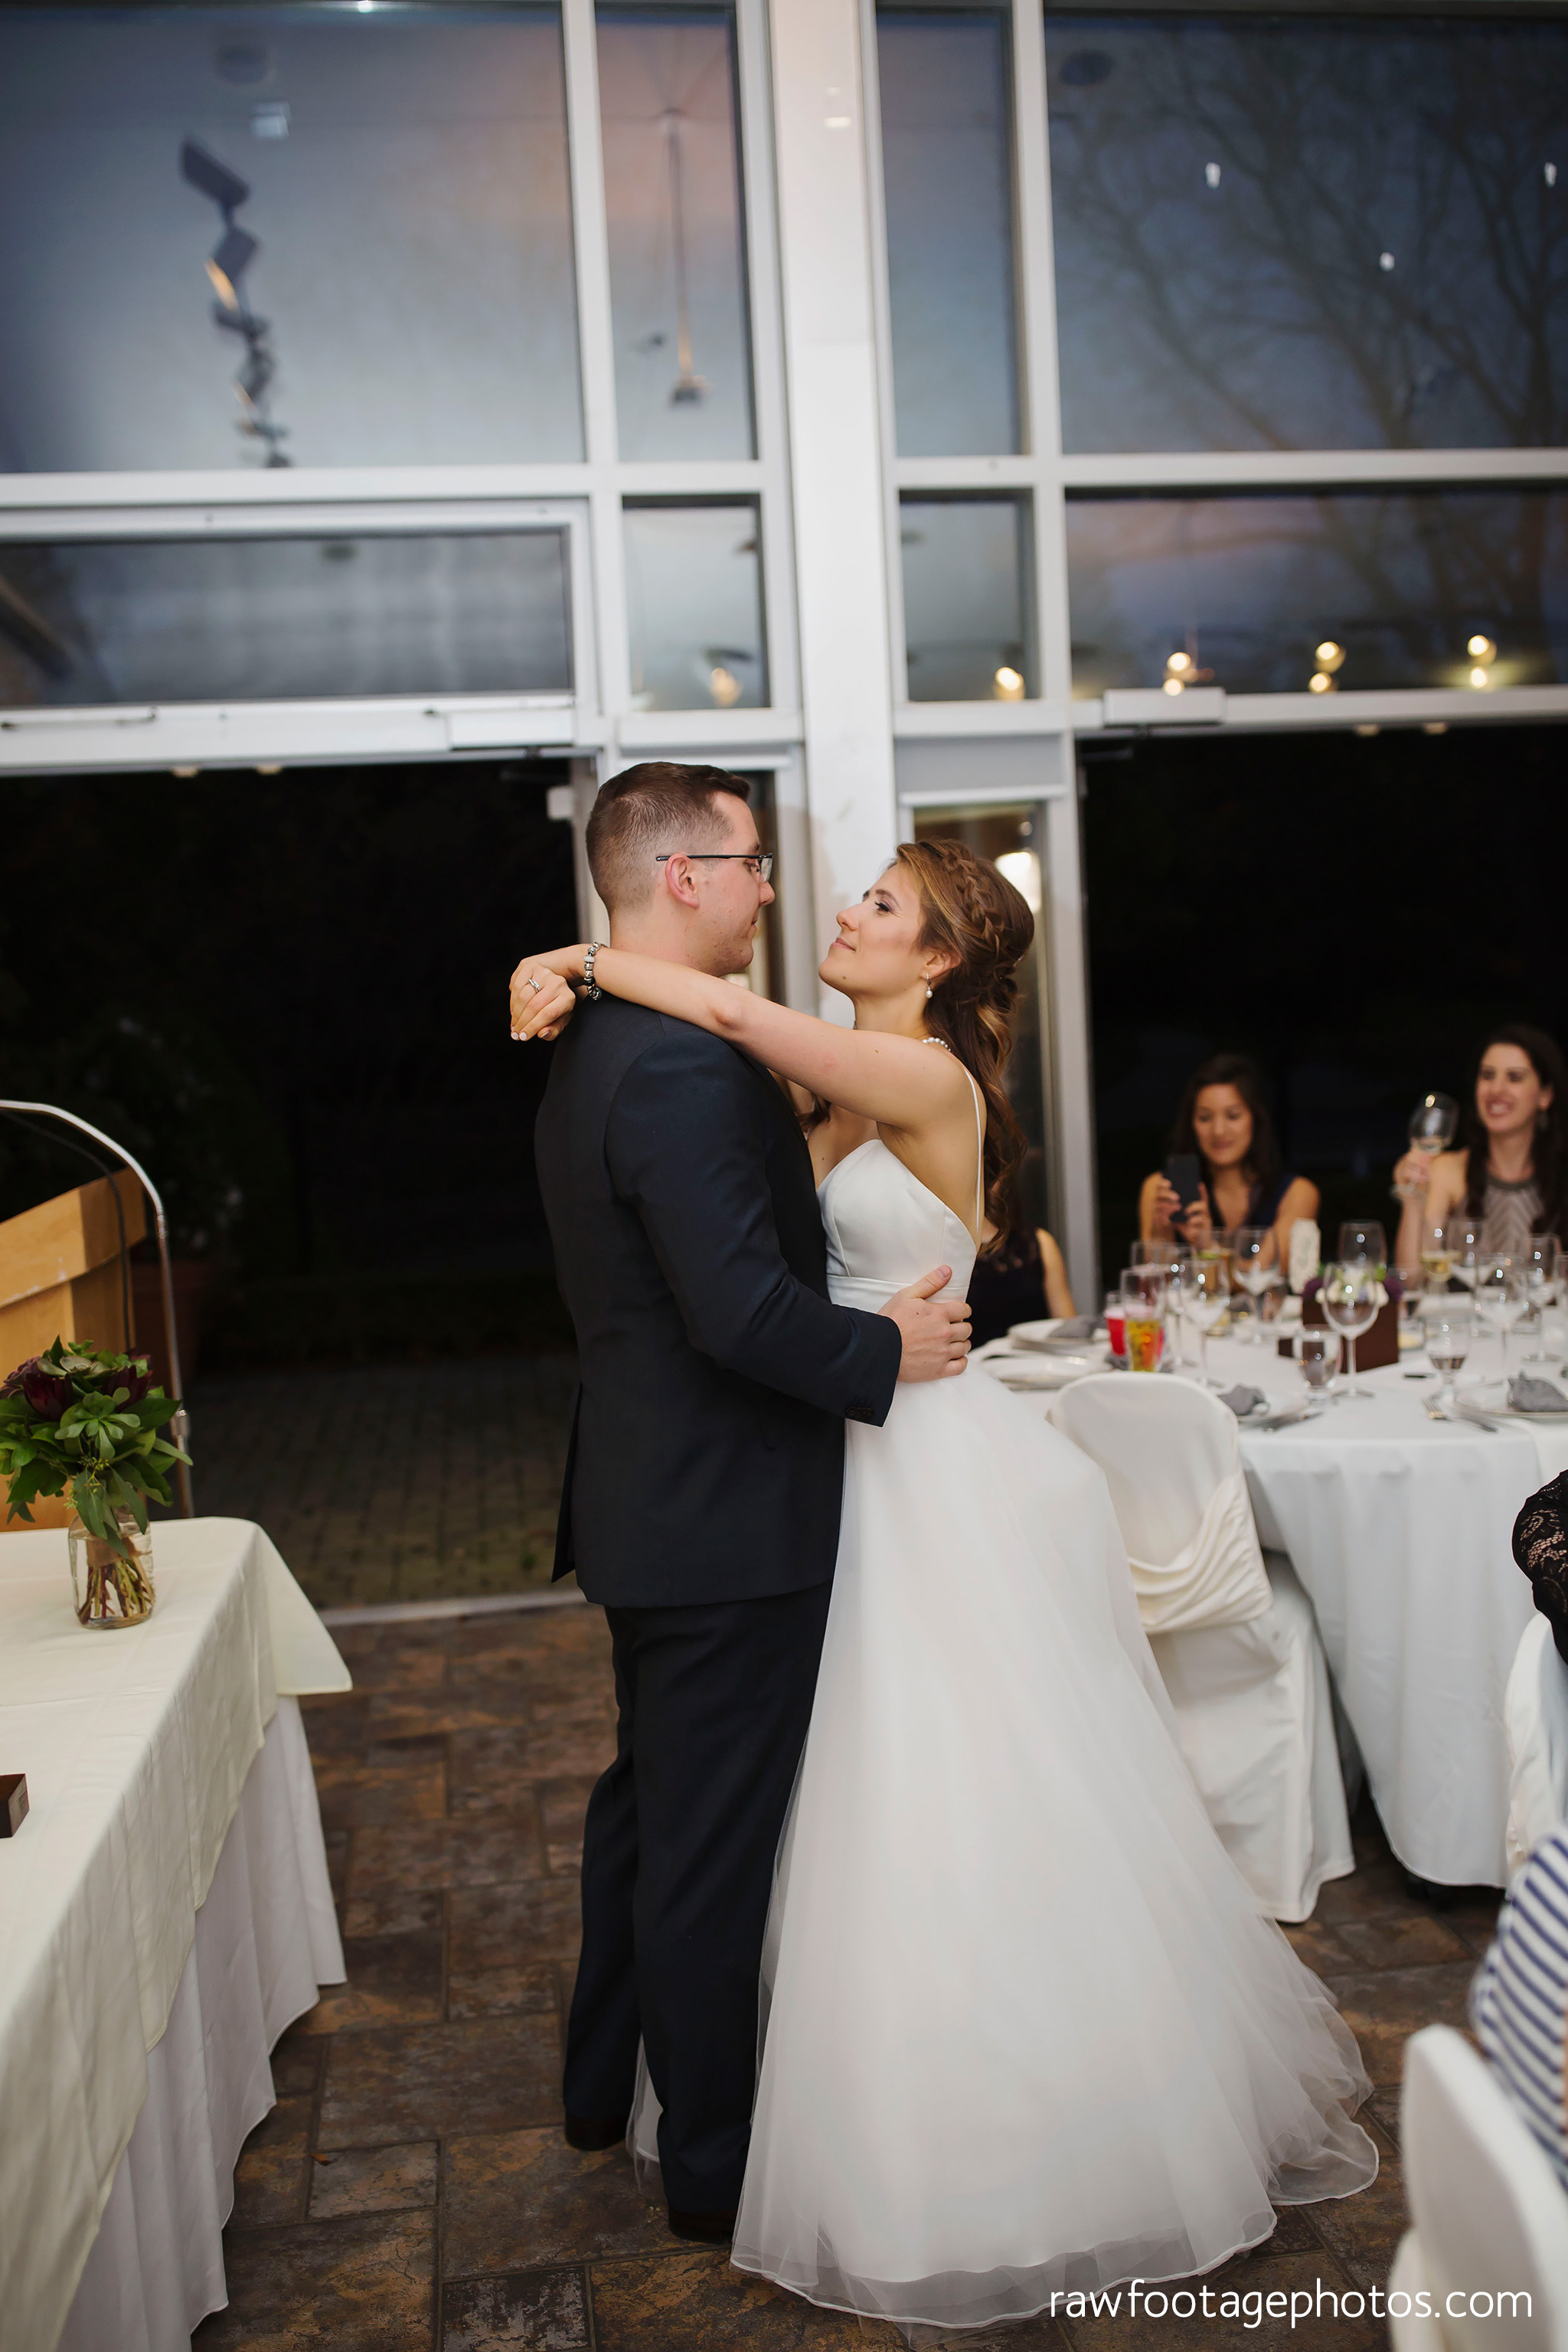 london_ontario_wedding_photographer-civic_gardens-springbank_park-succulent_bouquet-fall_wedding-bridge-raw_footage_photography077.jpg